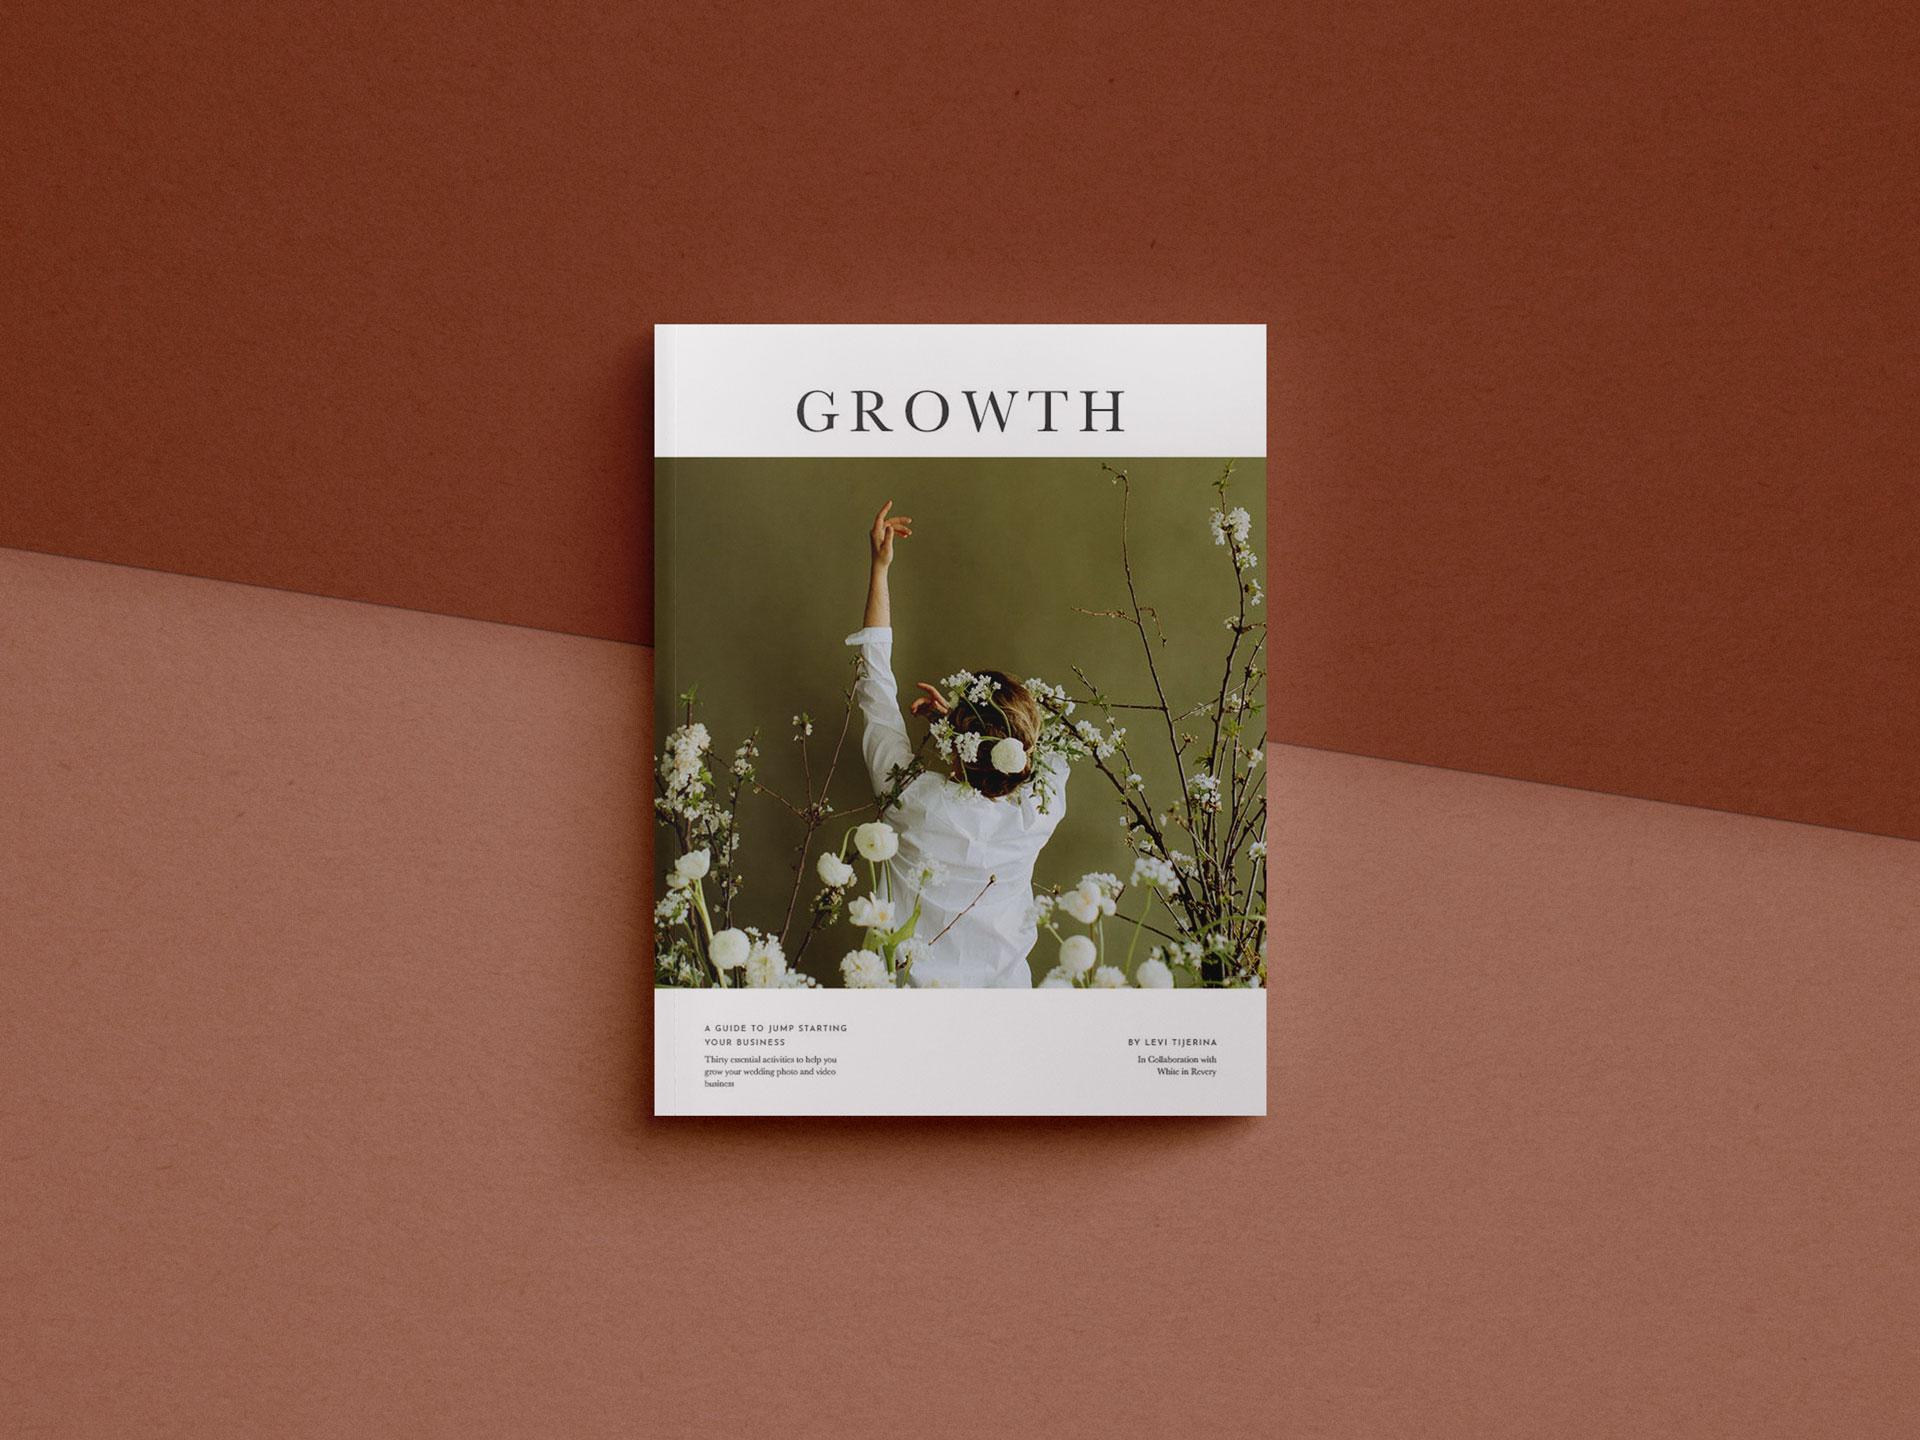 1.growth-cover.jpg